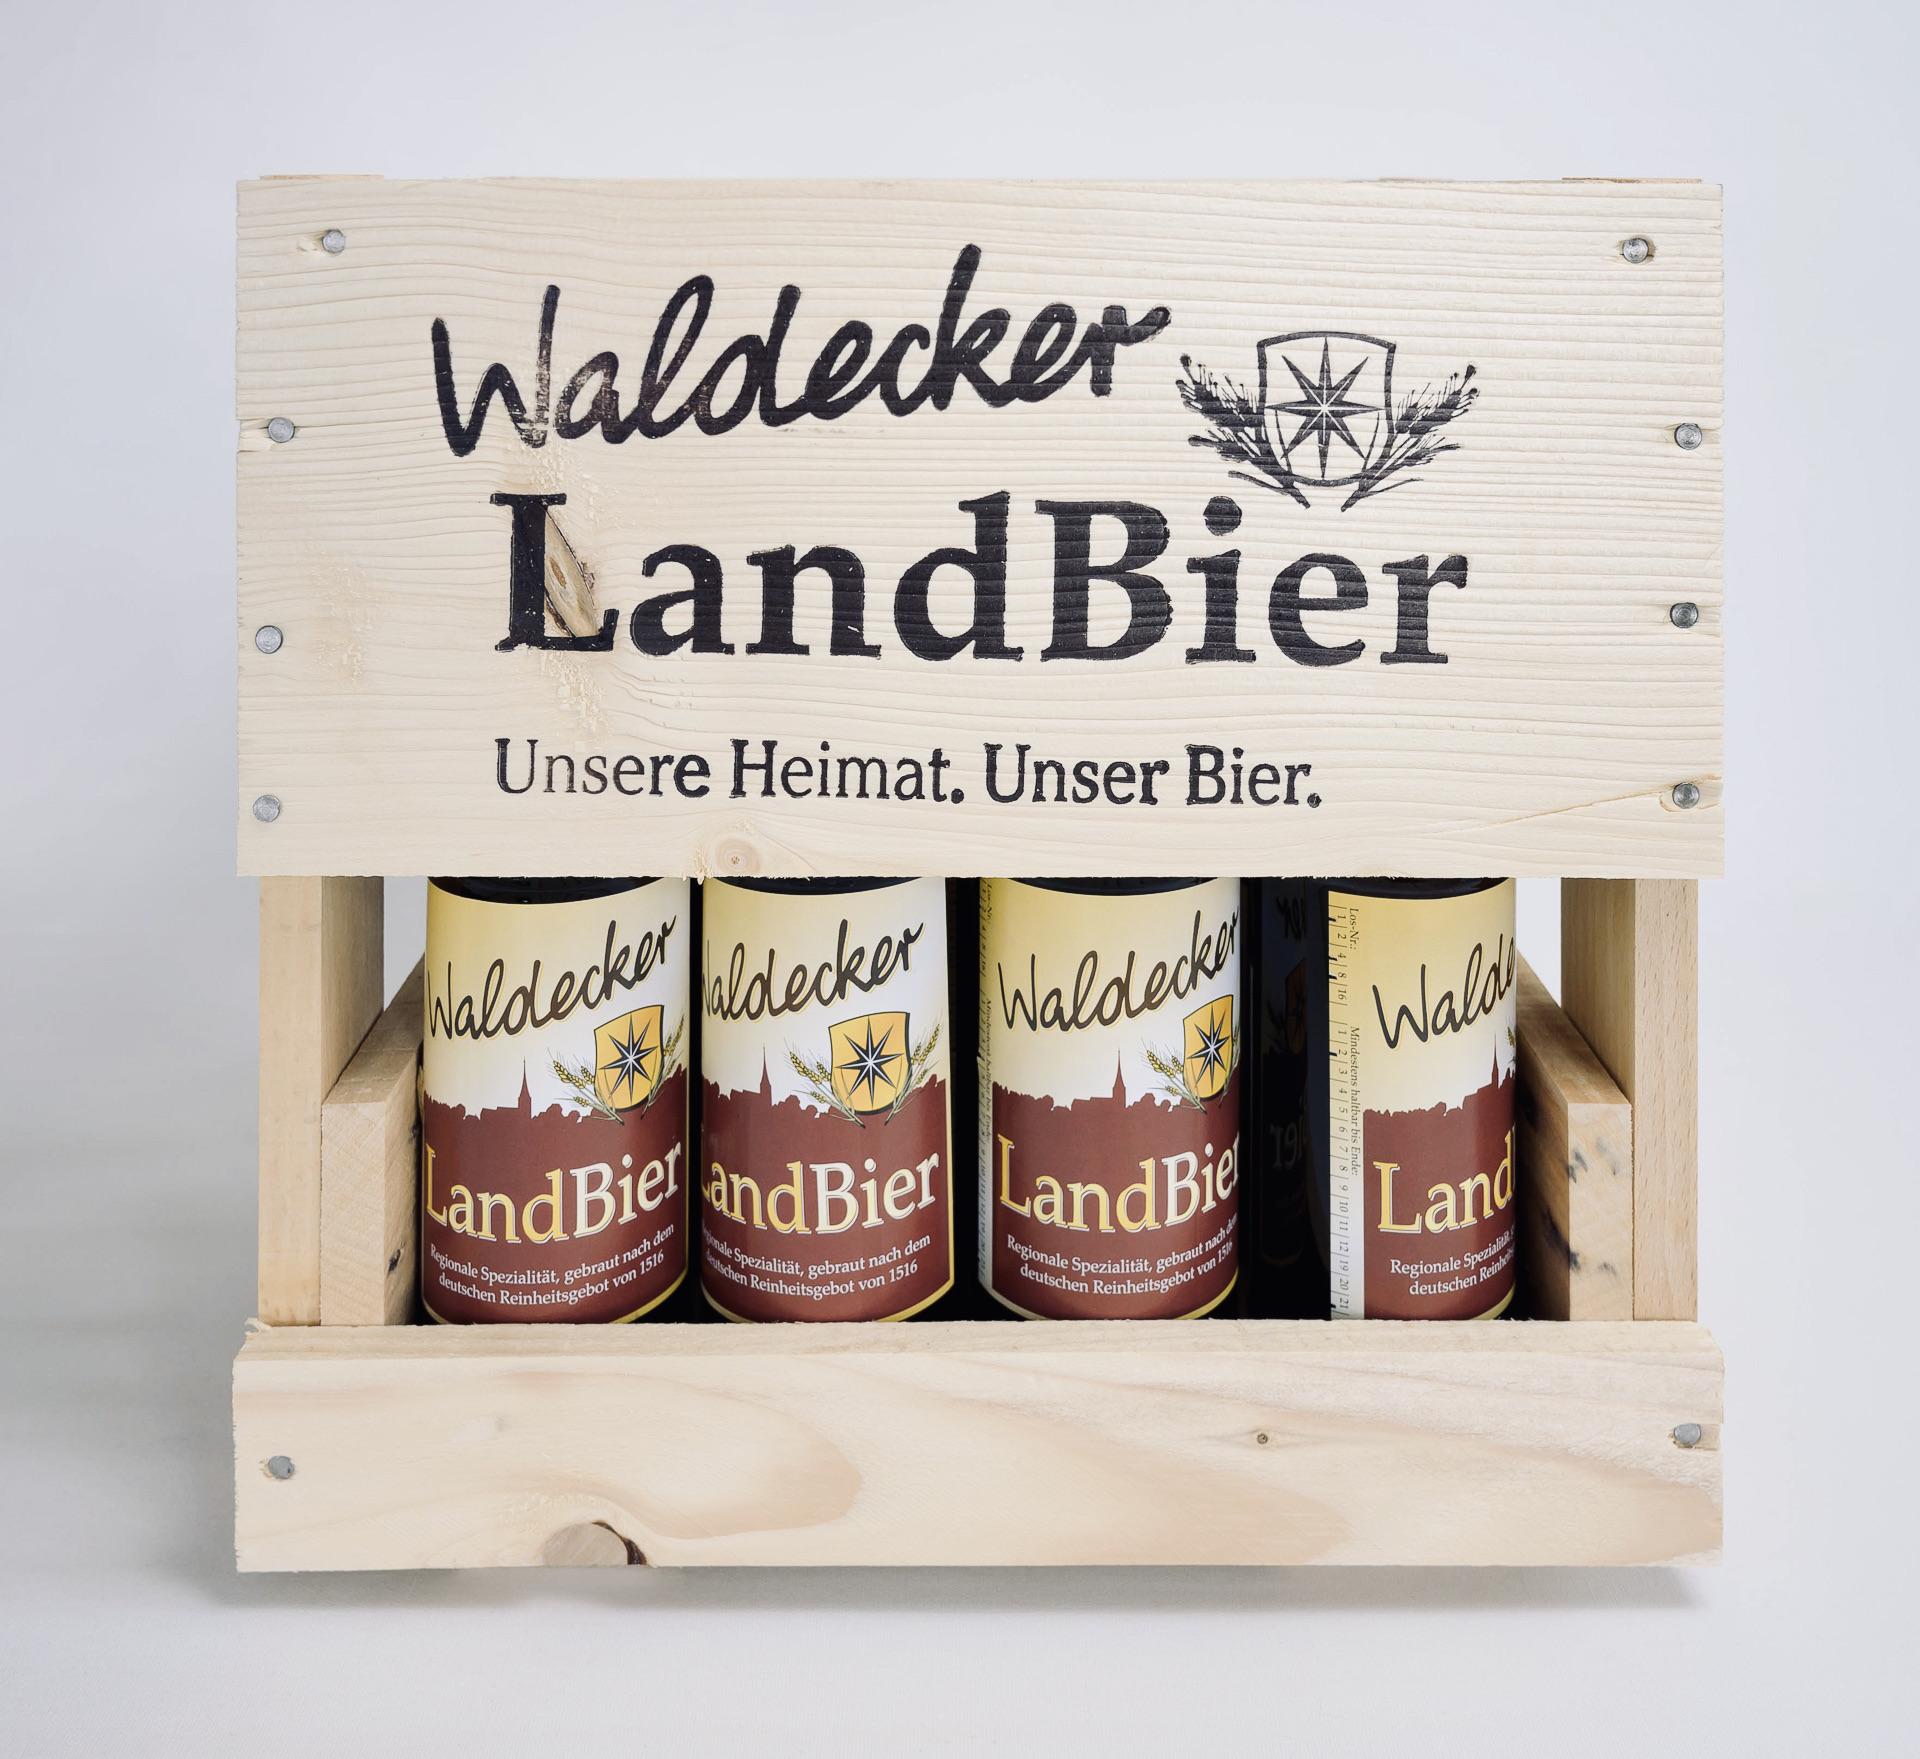 Waldecker Landbier, Bierkiste, Holzkiste